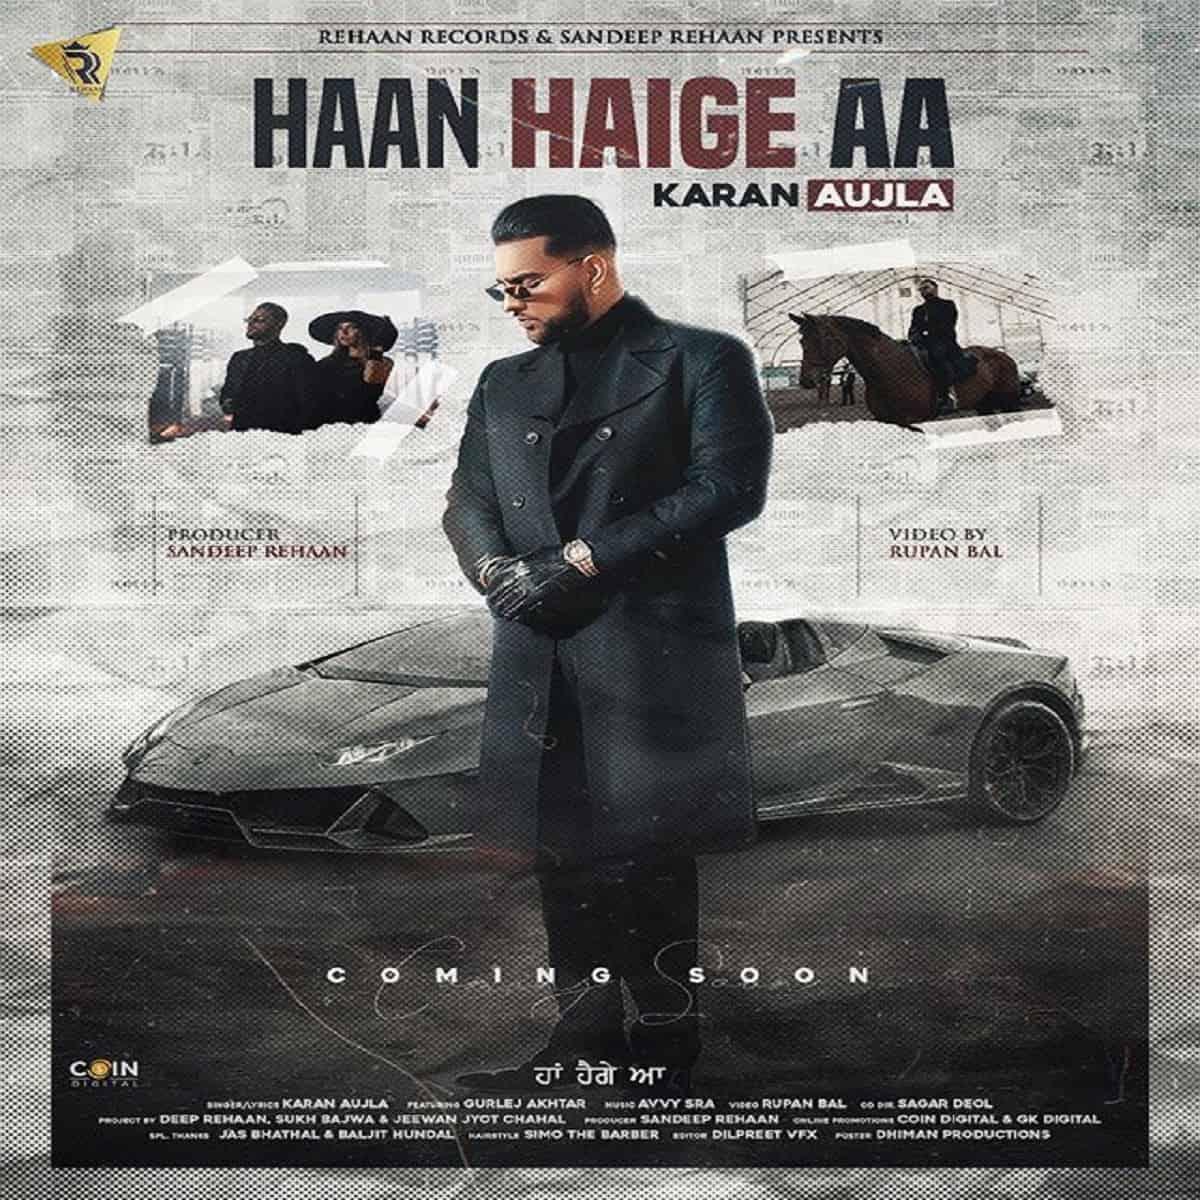 Haan Haige Aa Song Cast: Karan Aujla ft. Gurlez Akhtar